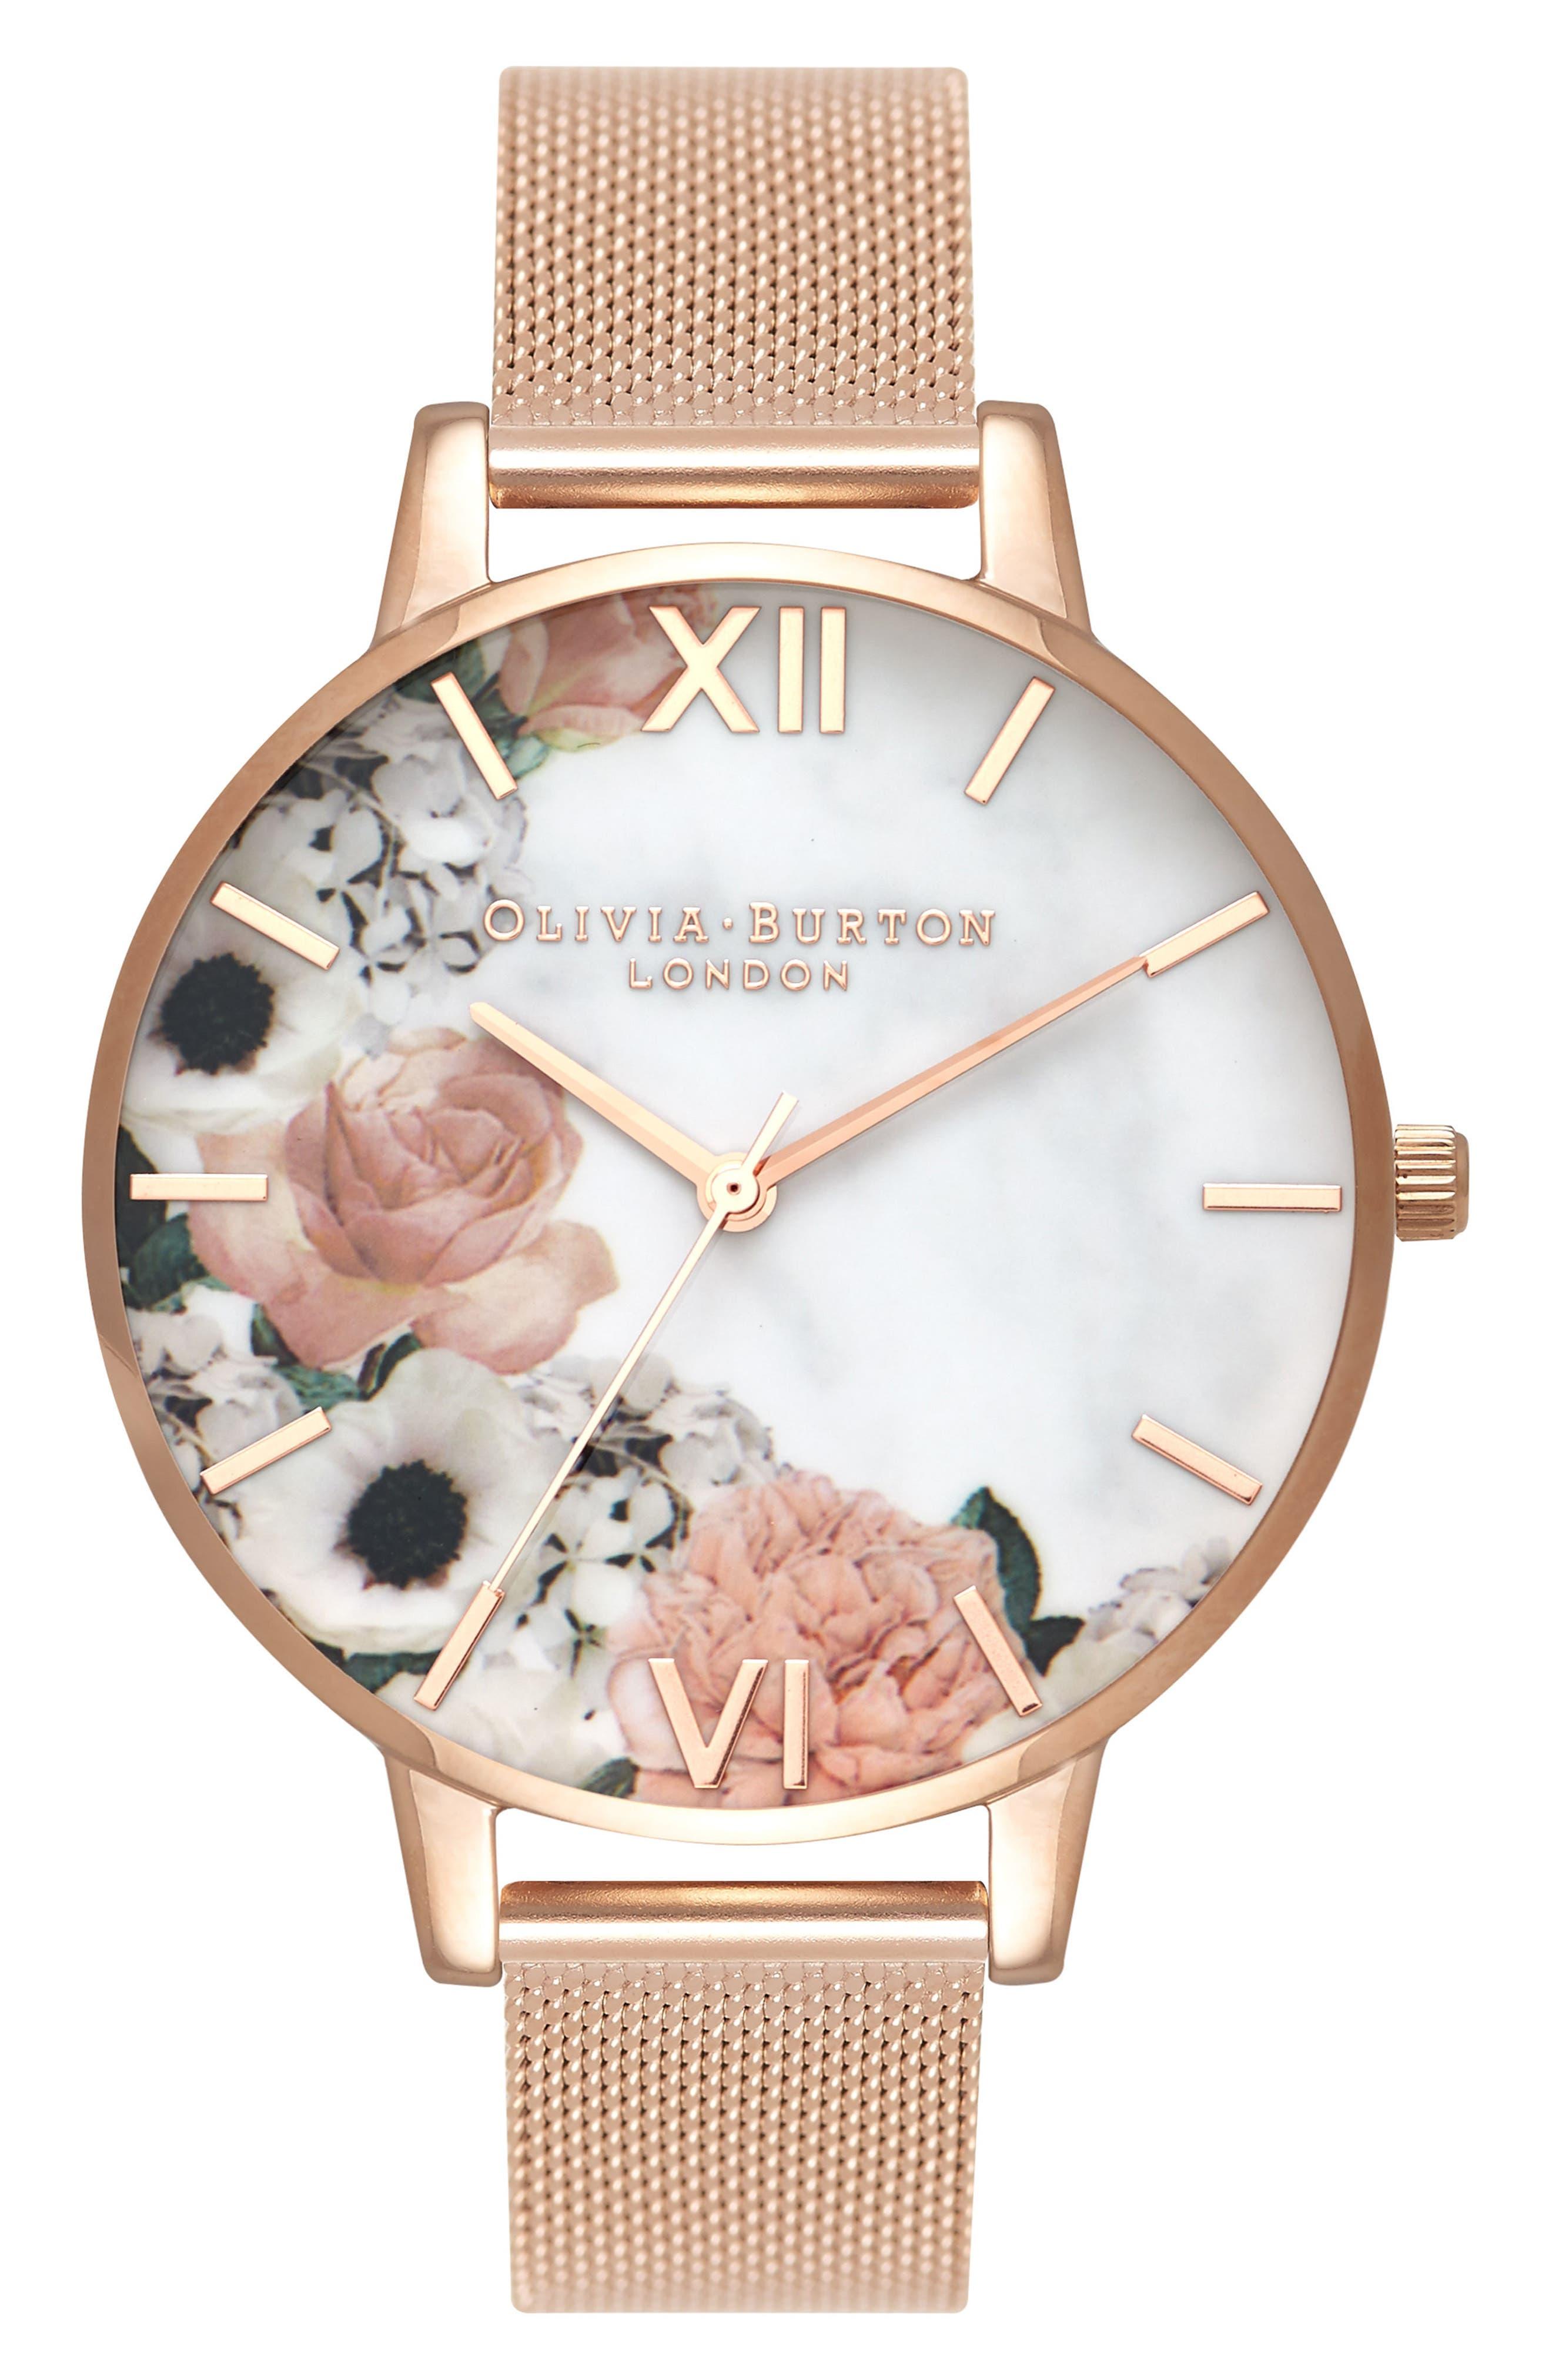 OLIVIA BURTON, Marble Floral Mesh Strap Watch, 38mm, Main thumbnail 1, color, 712